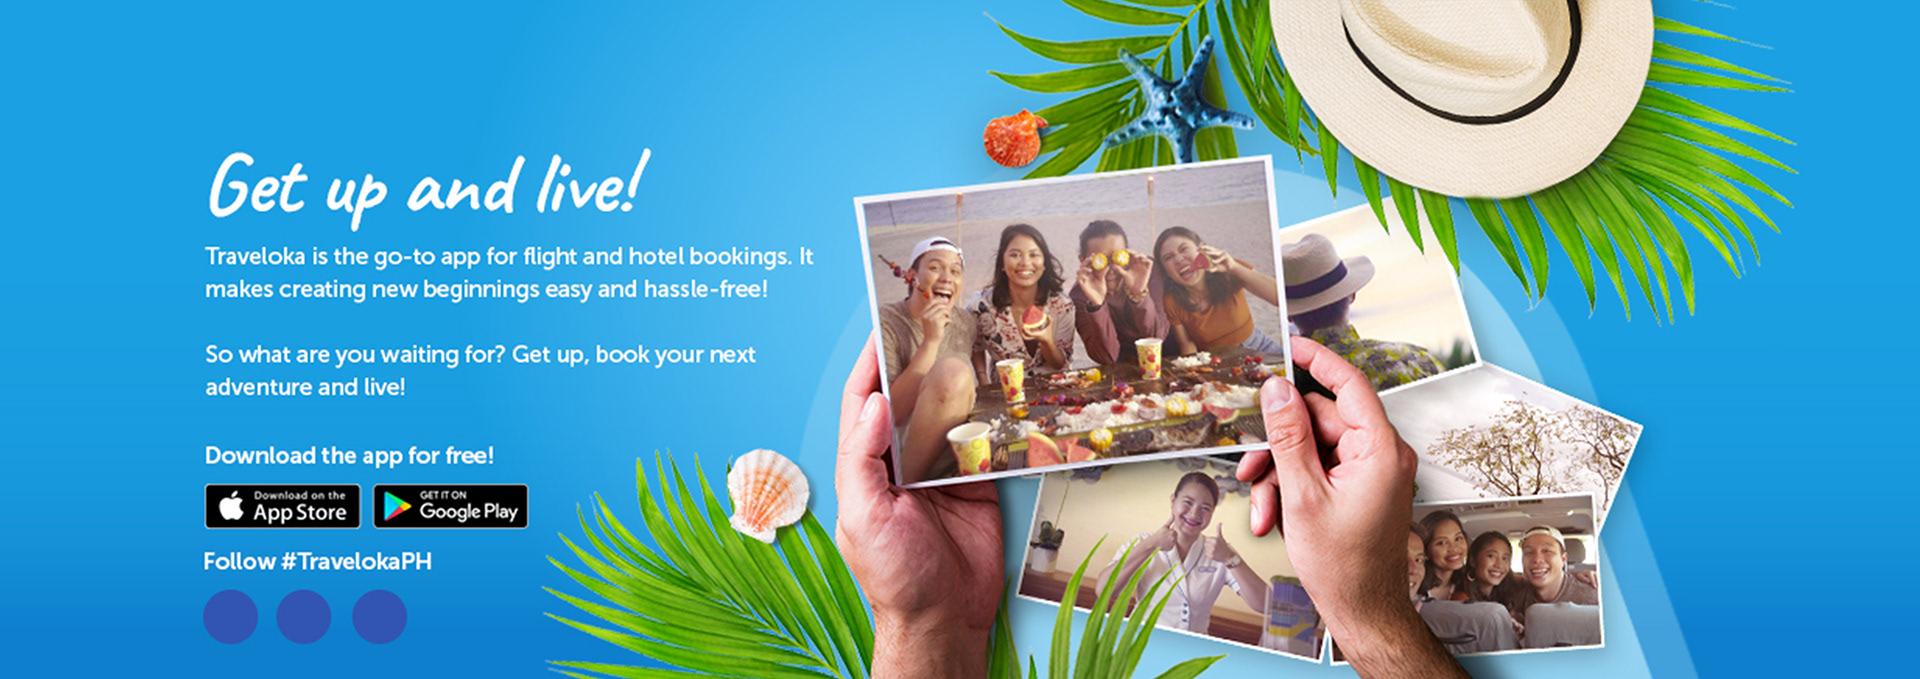 Illustration Portfolio Traveloka Promotion Banners